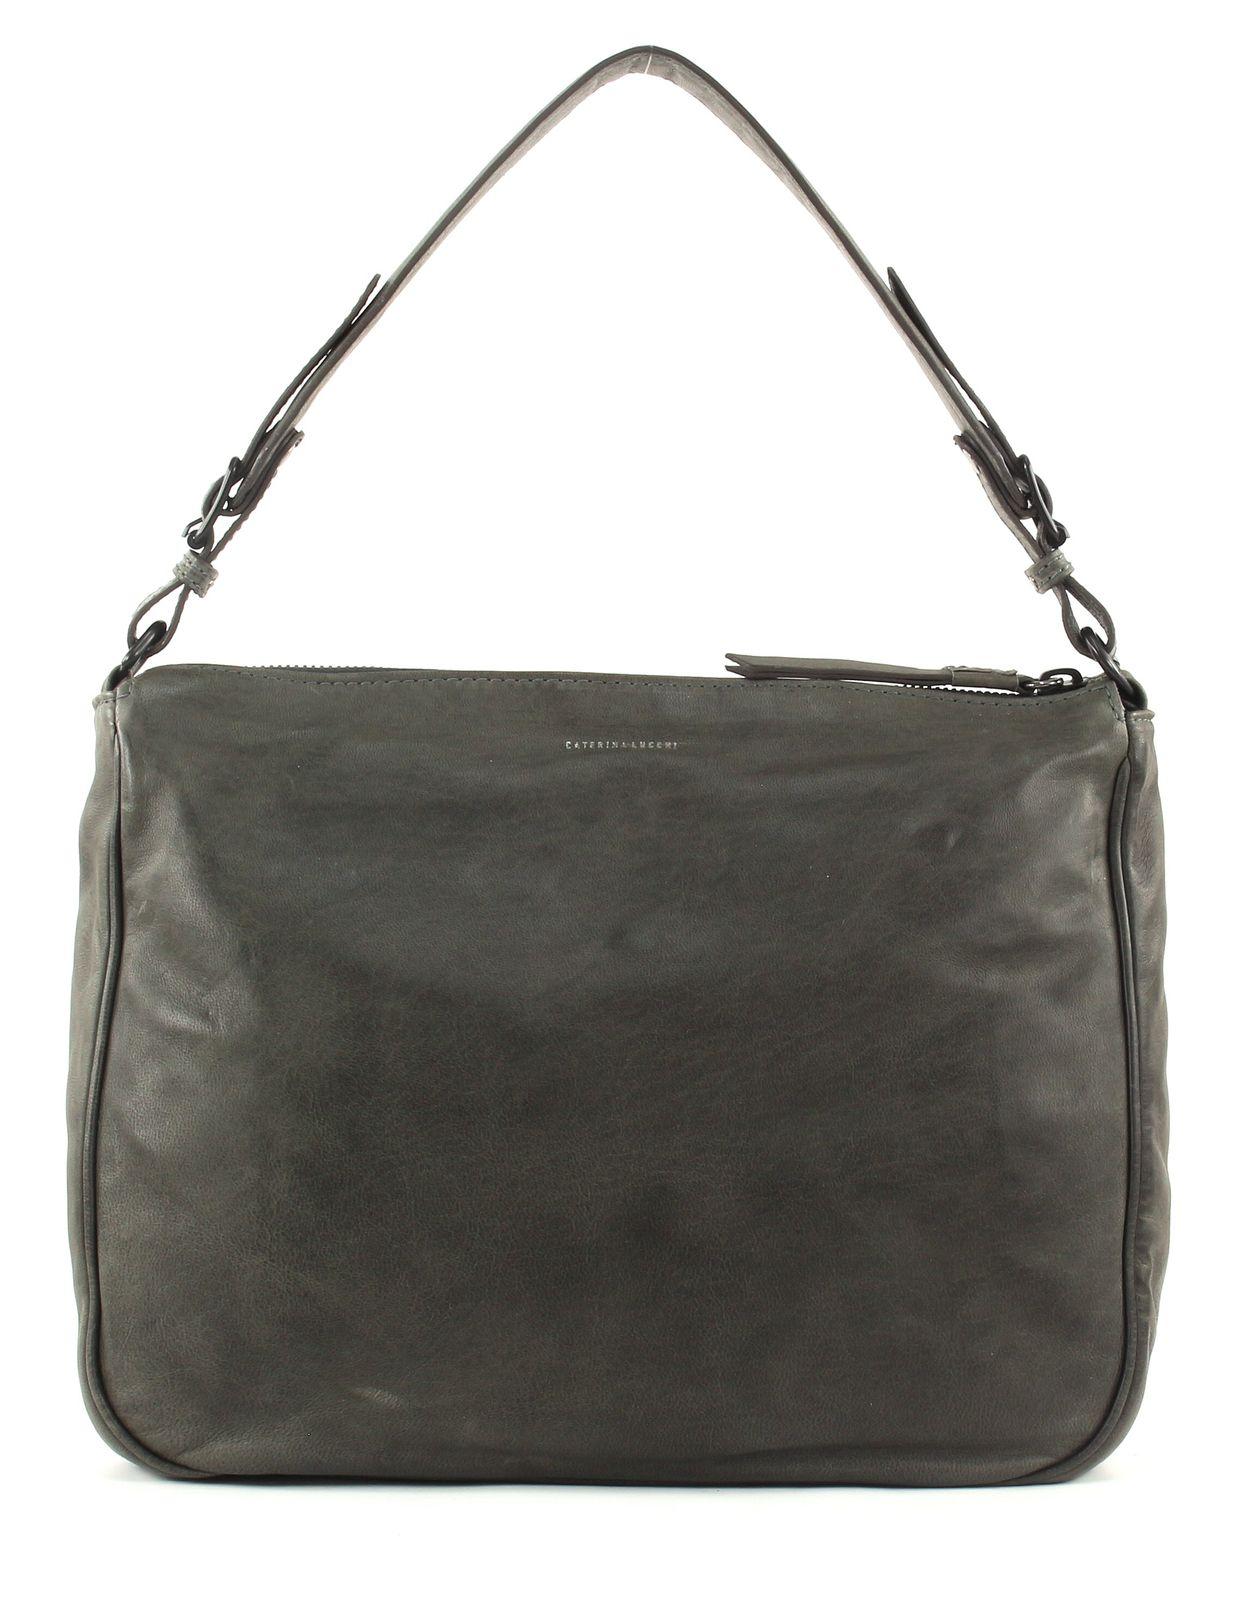 6c0b8d7108 CATERINA LUCCHI Shoulder Bag Agnello Hobo 8052795164384